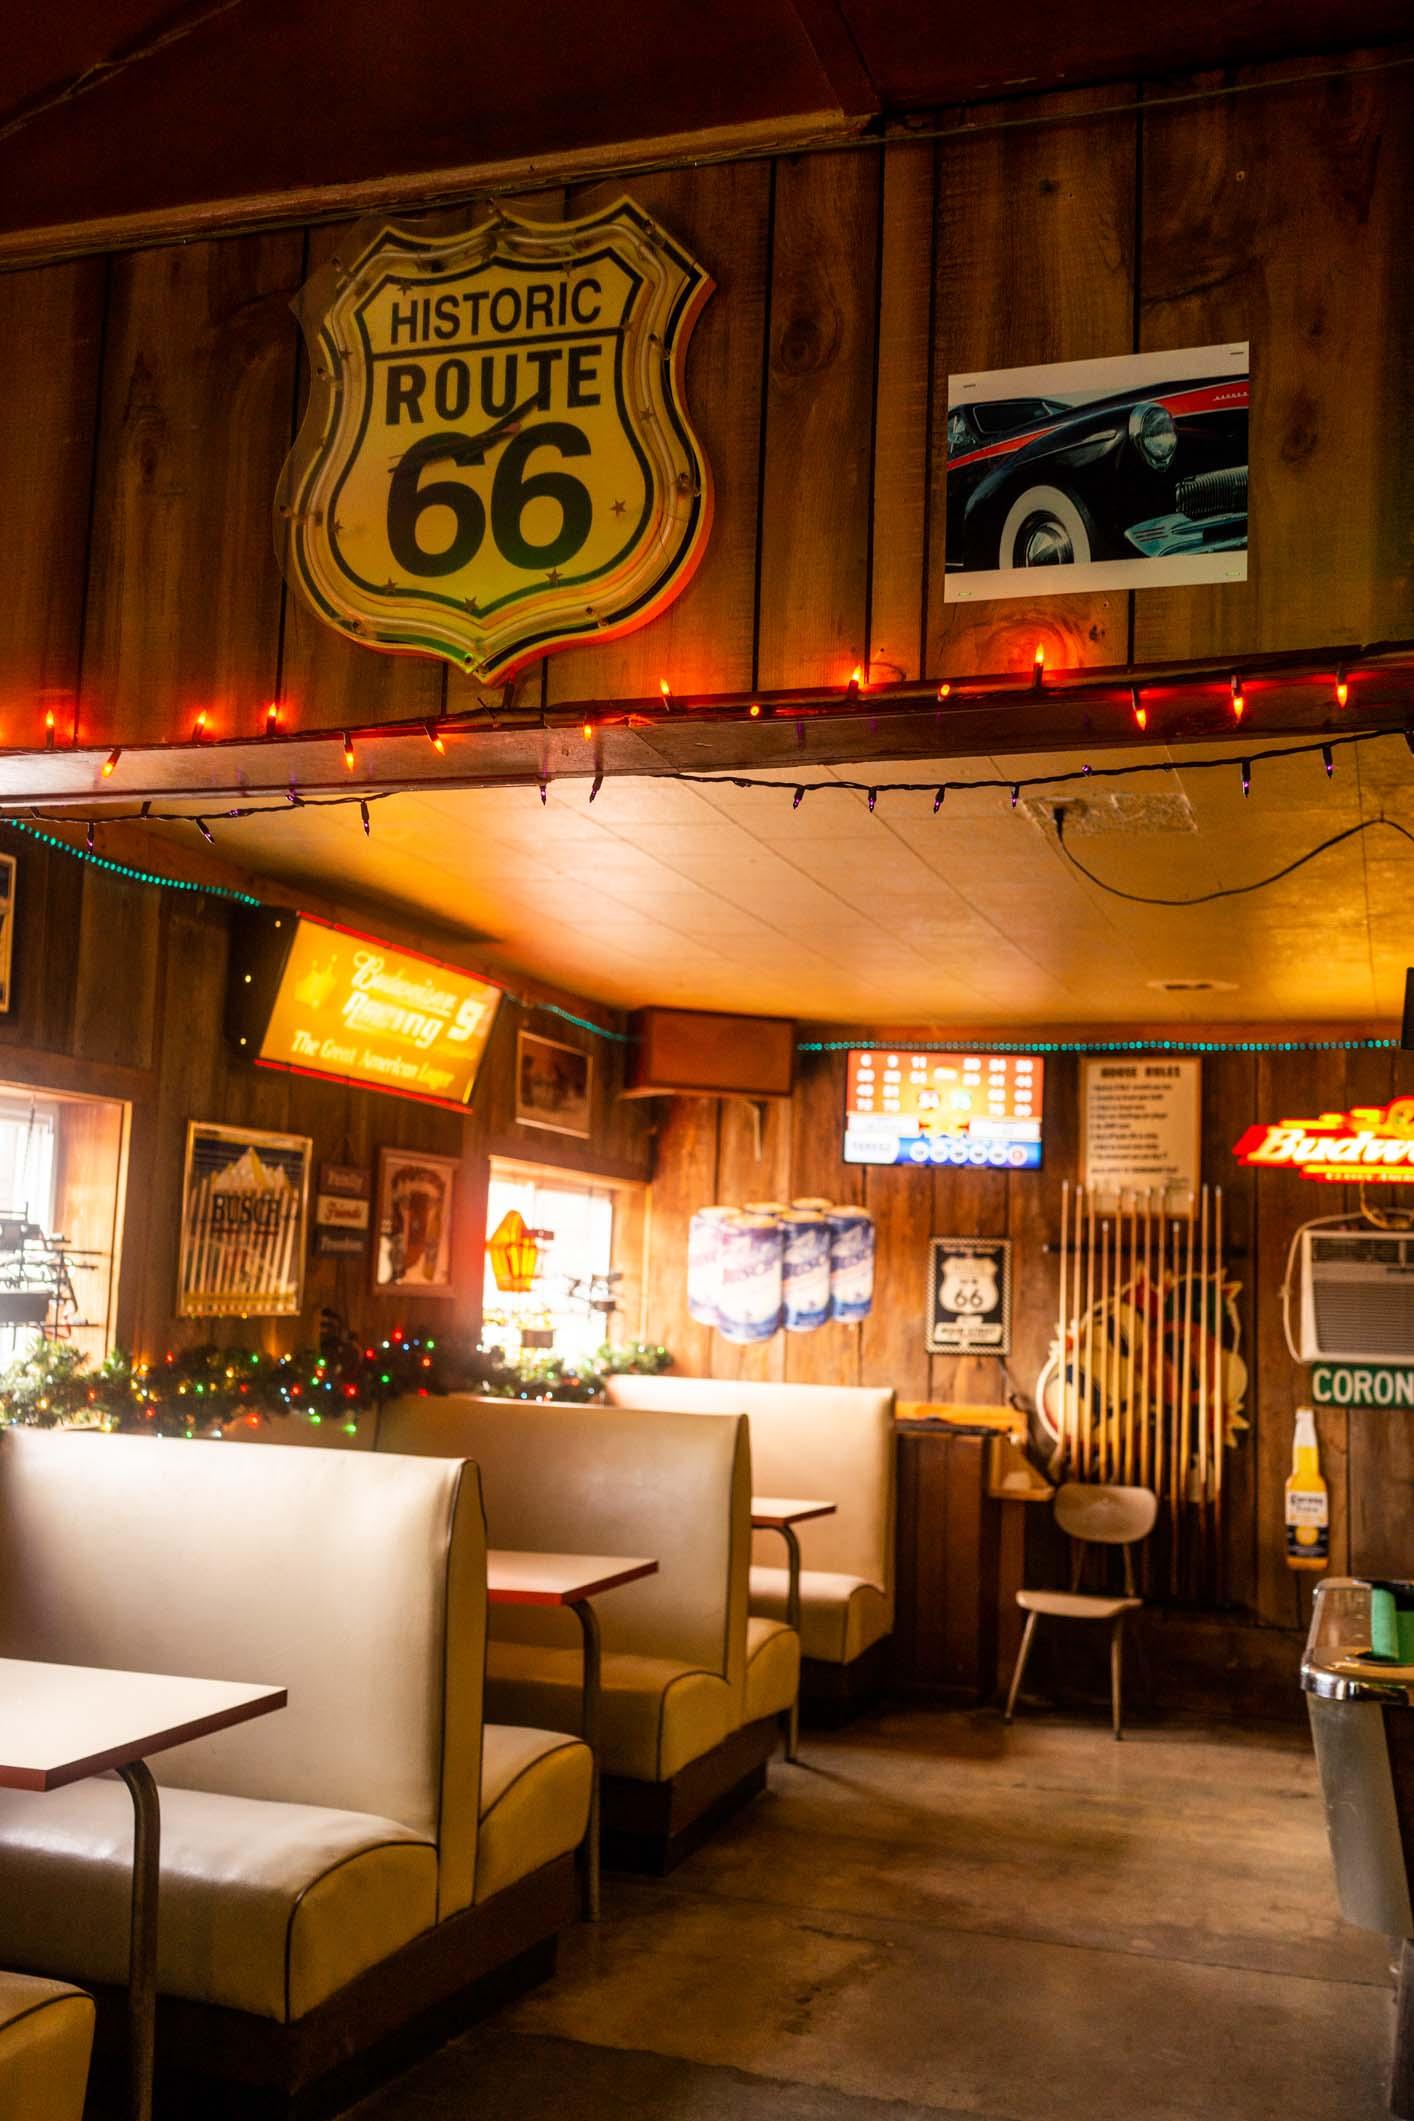 Route 66 bar